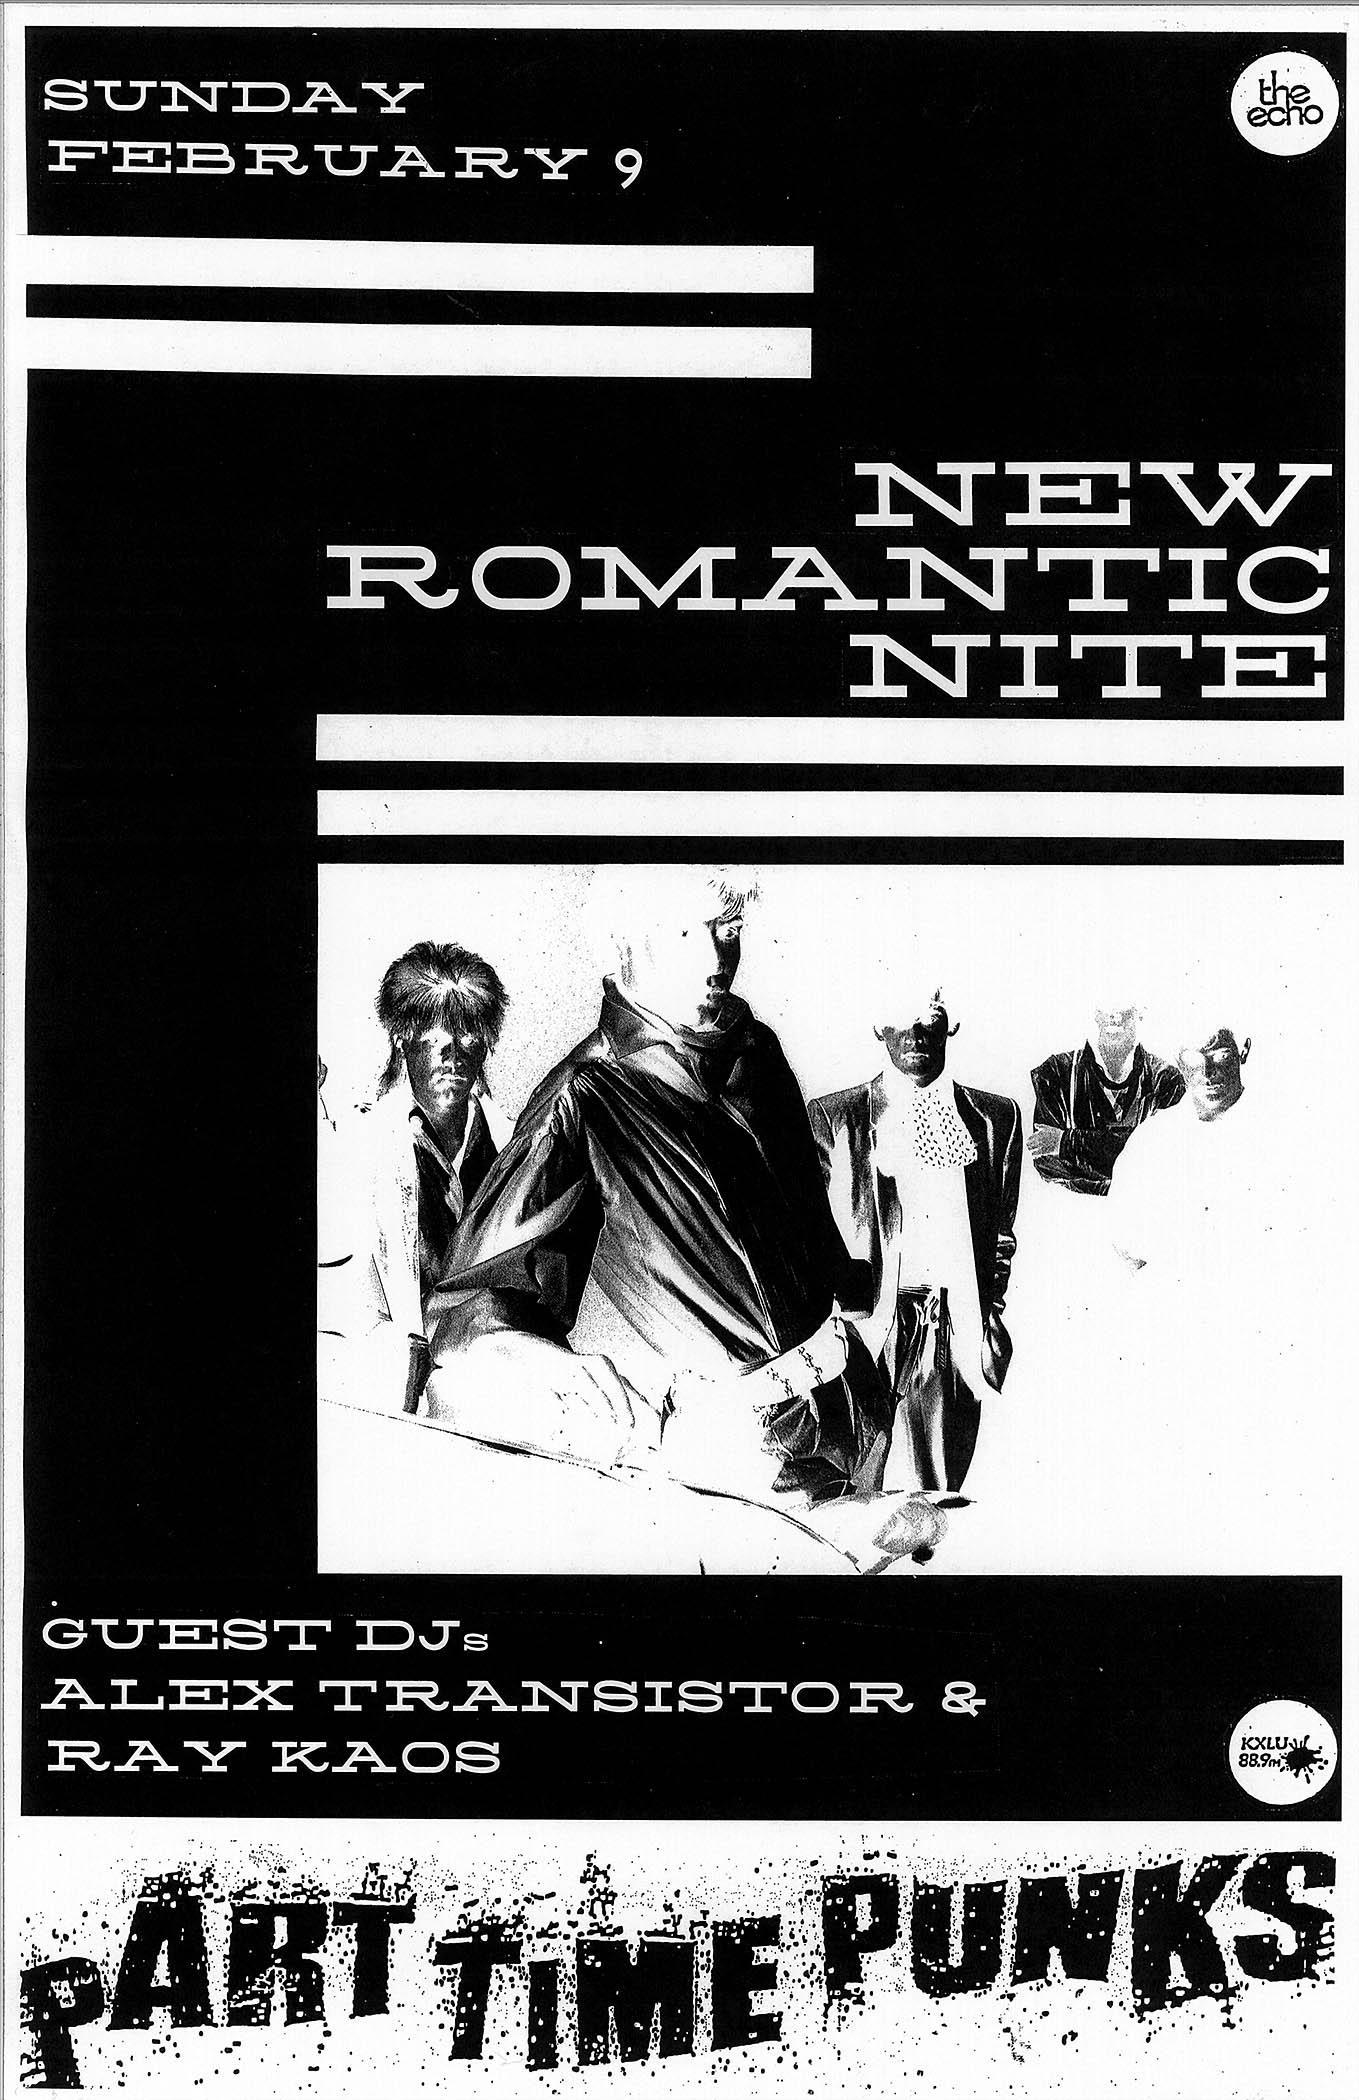 NEW ROMANTIC NITE w/Guest DJs Alex Transistor & Ray Kaos